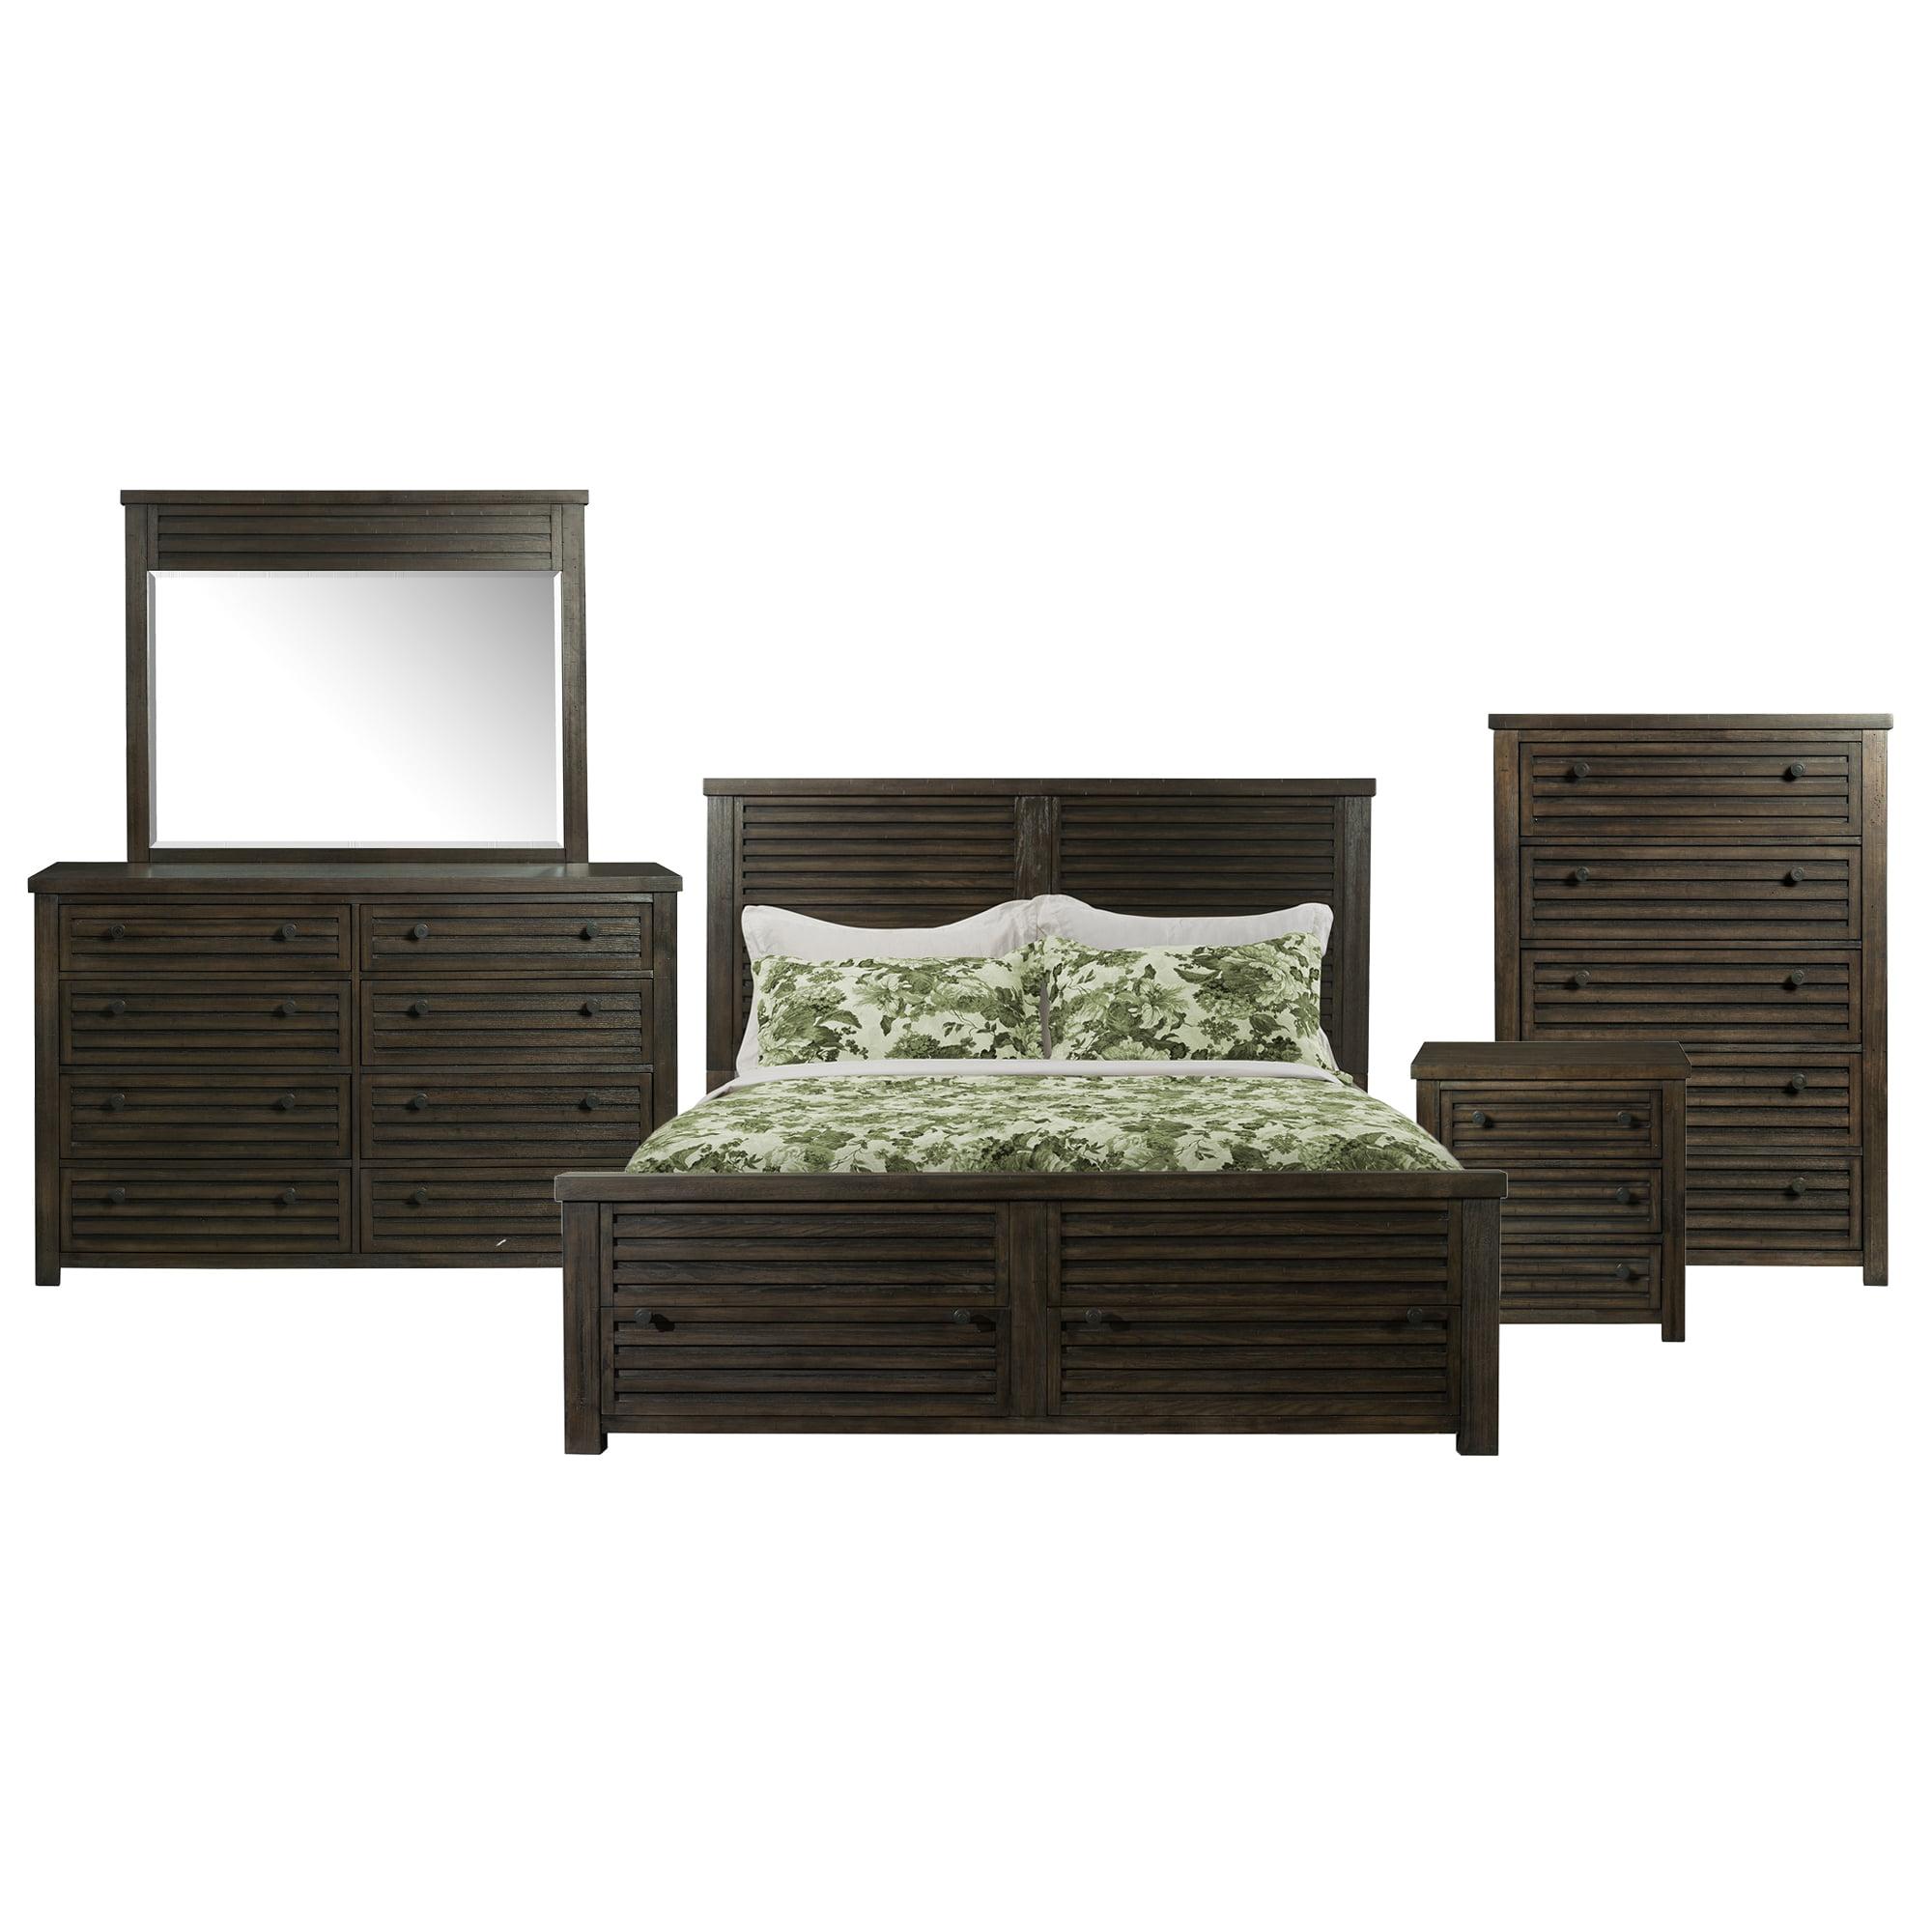 Picket House Furnishings Montego King Storage 5PC Bedroom Set